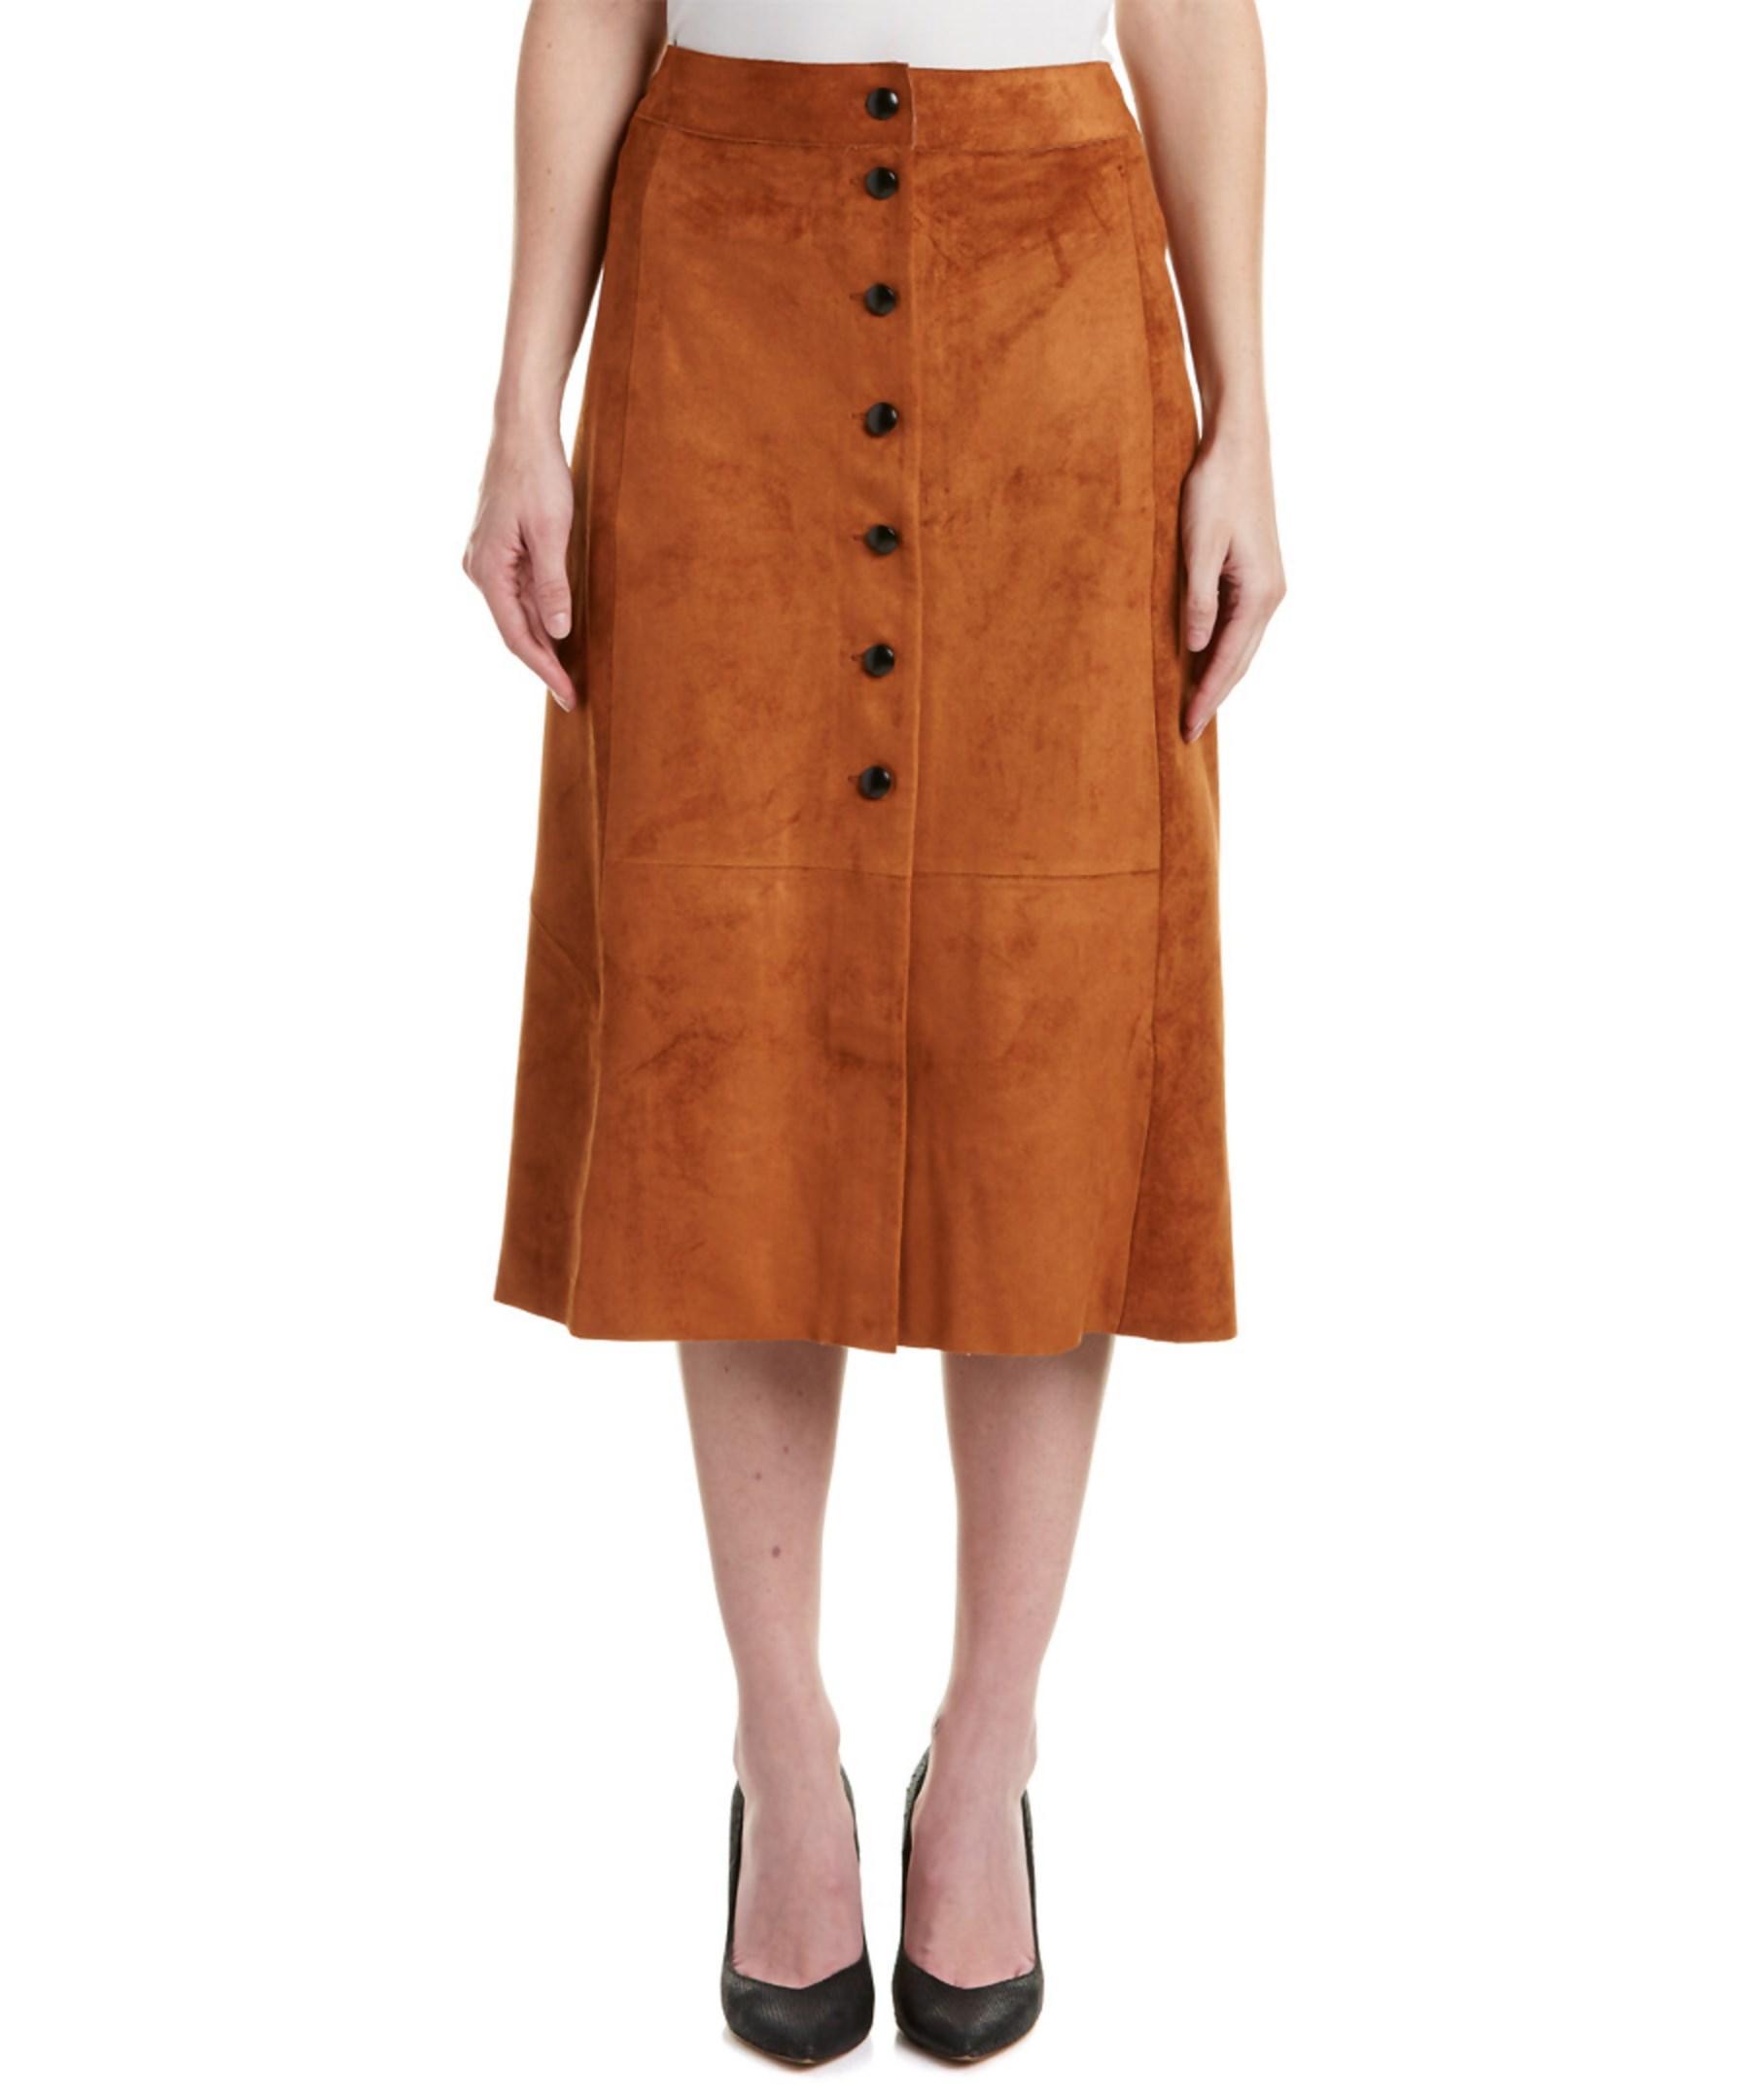 catherine malandrino midi skirt in brown lyst